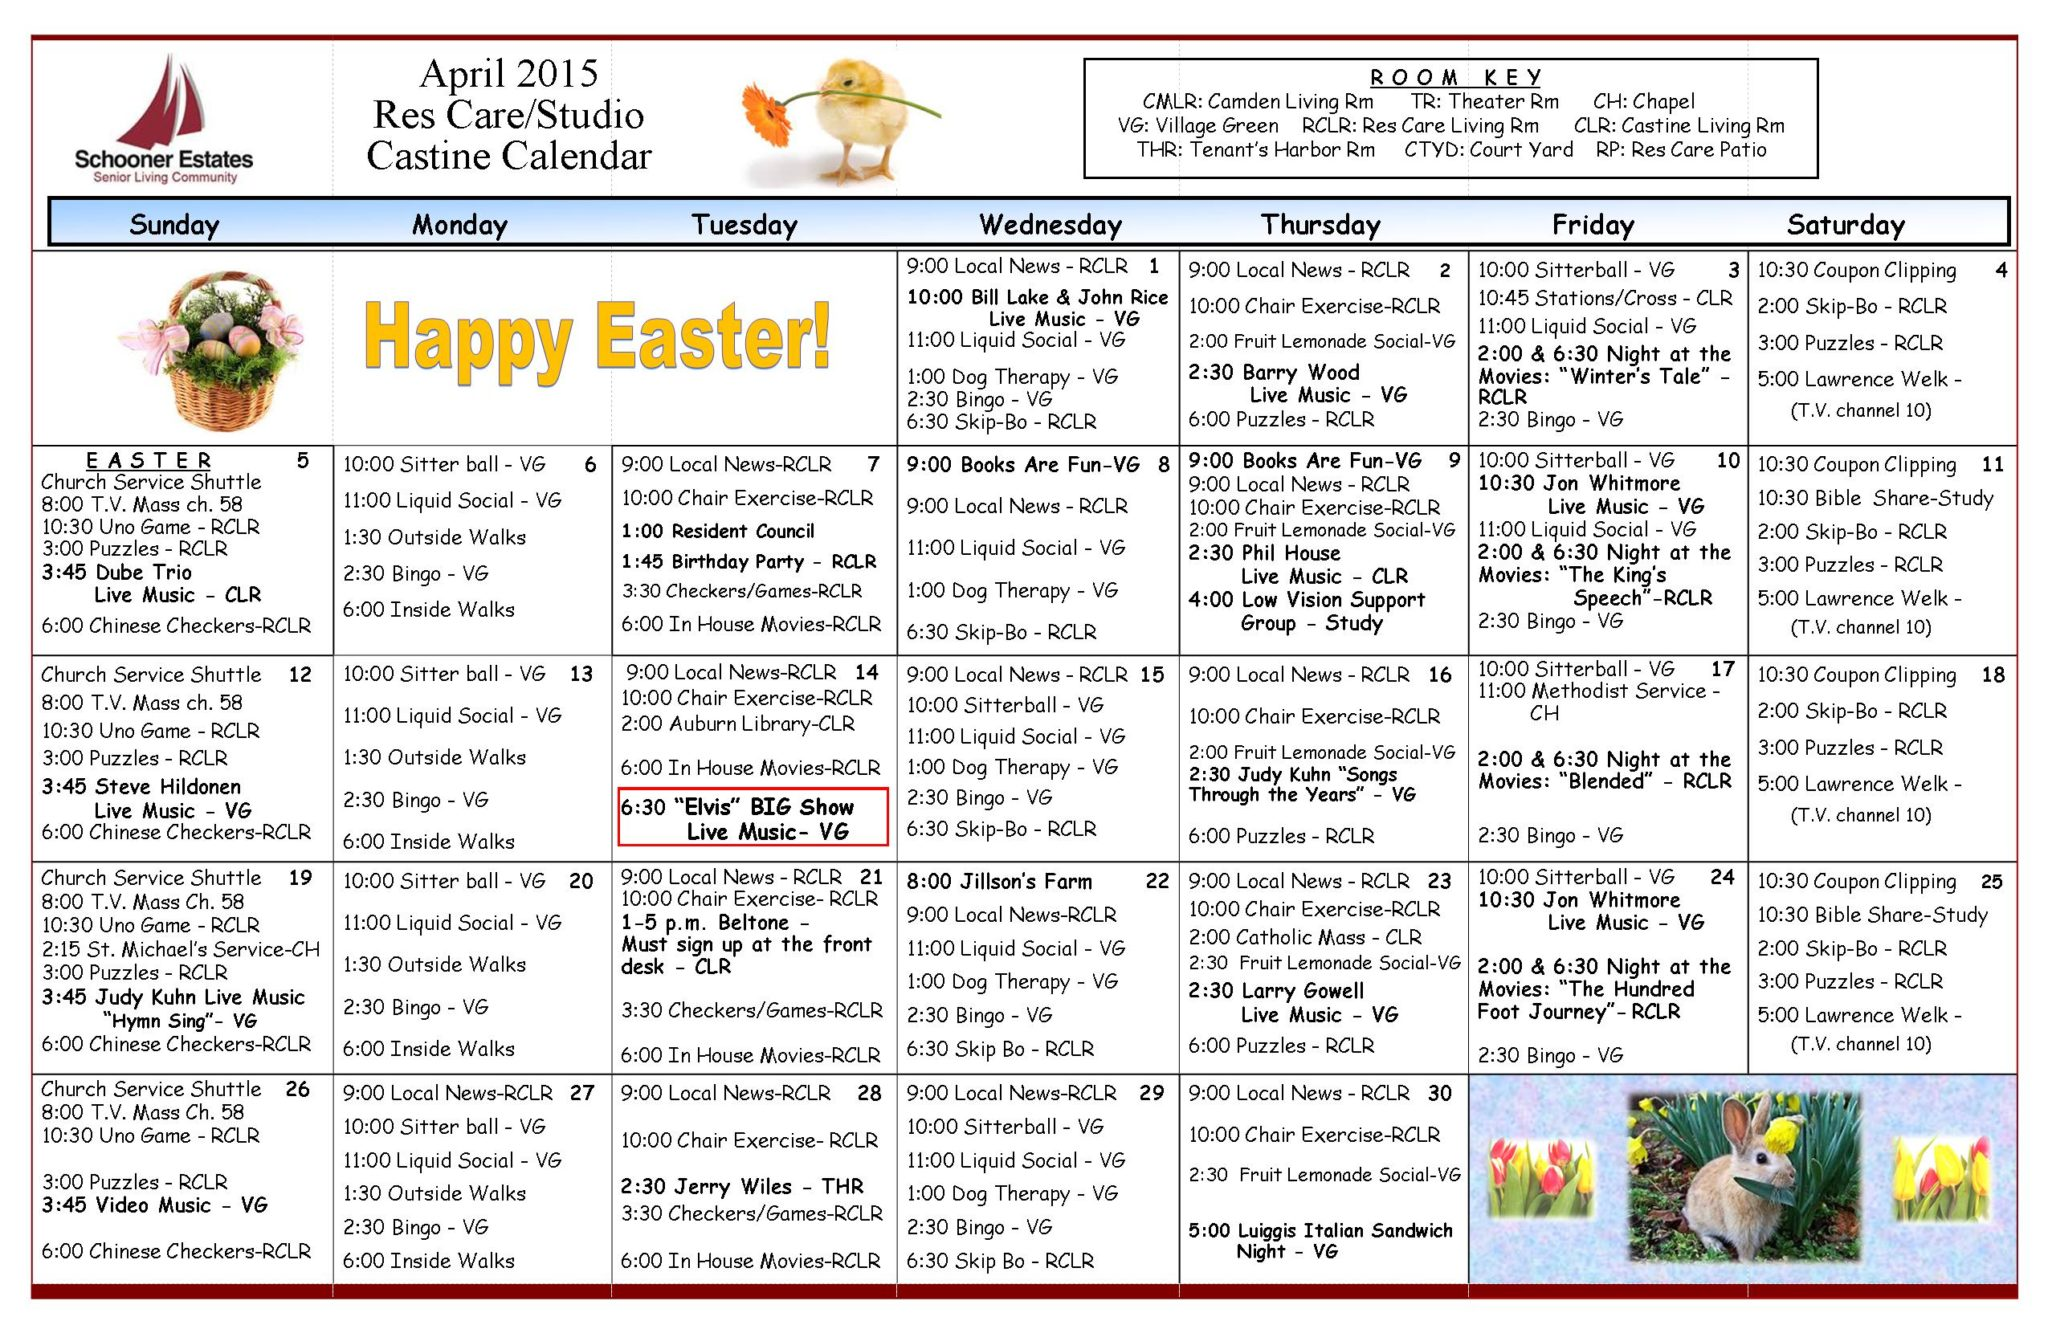 04 Res Care April Calendar 2015